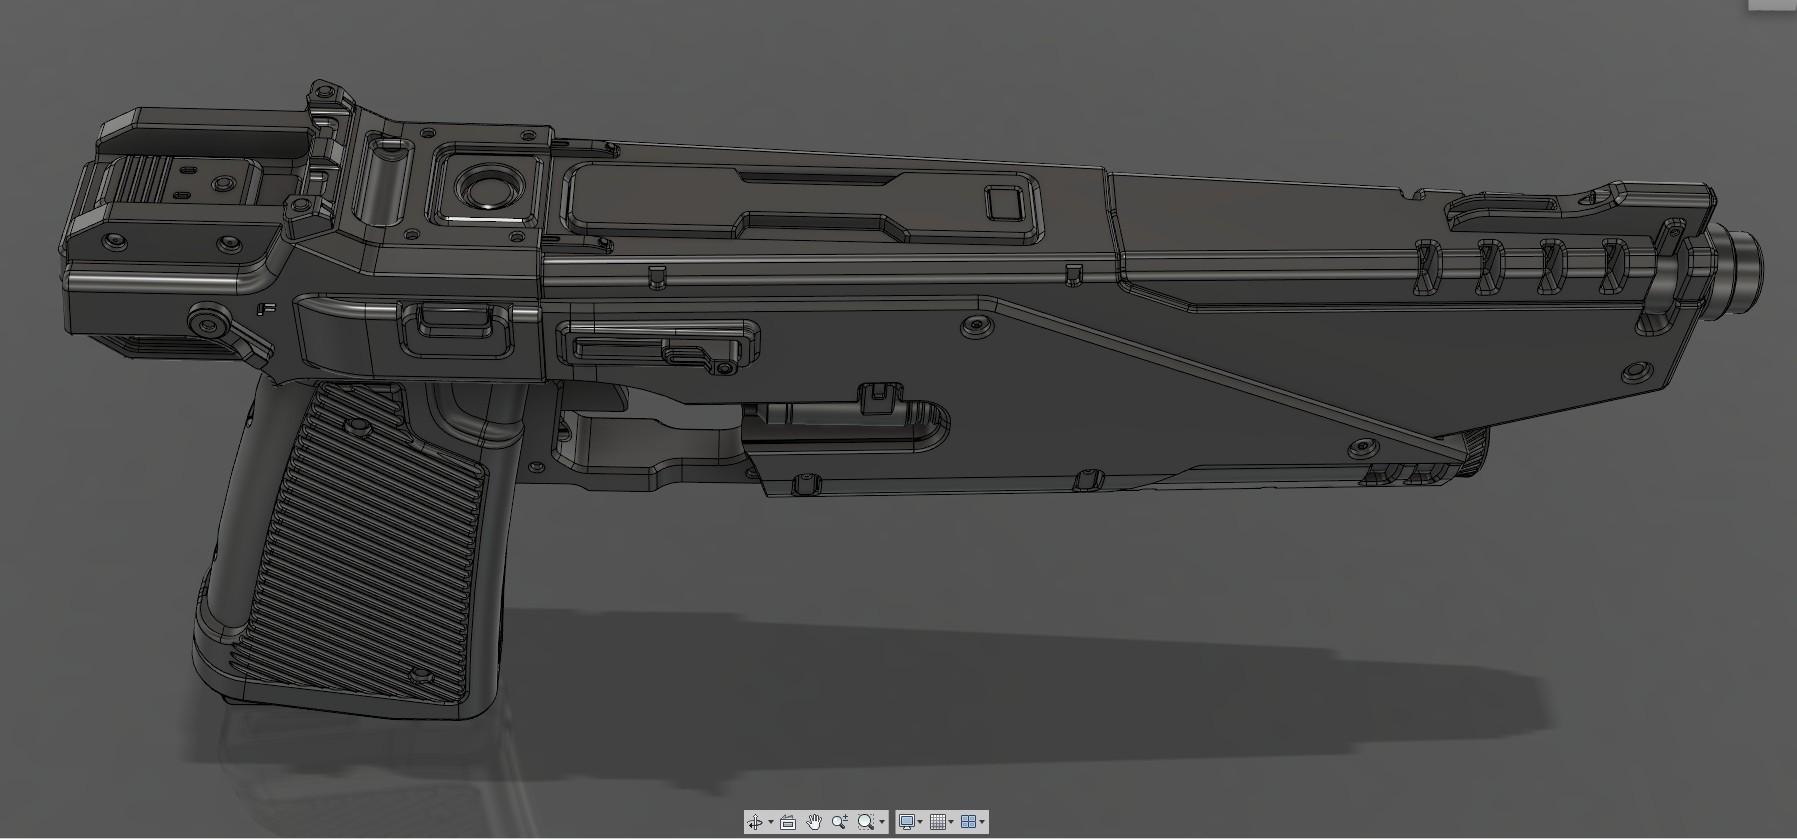 CropImage3.jpg Download STL file WESTAR 35 blaster pistol  • 3D printable object, 3dpicasso